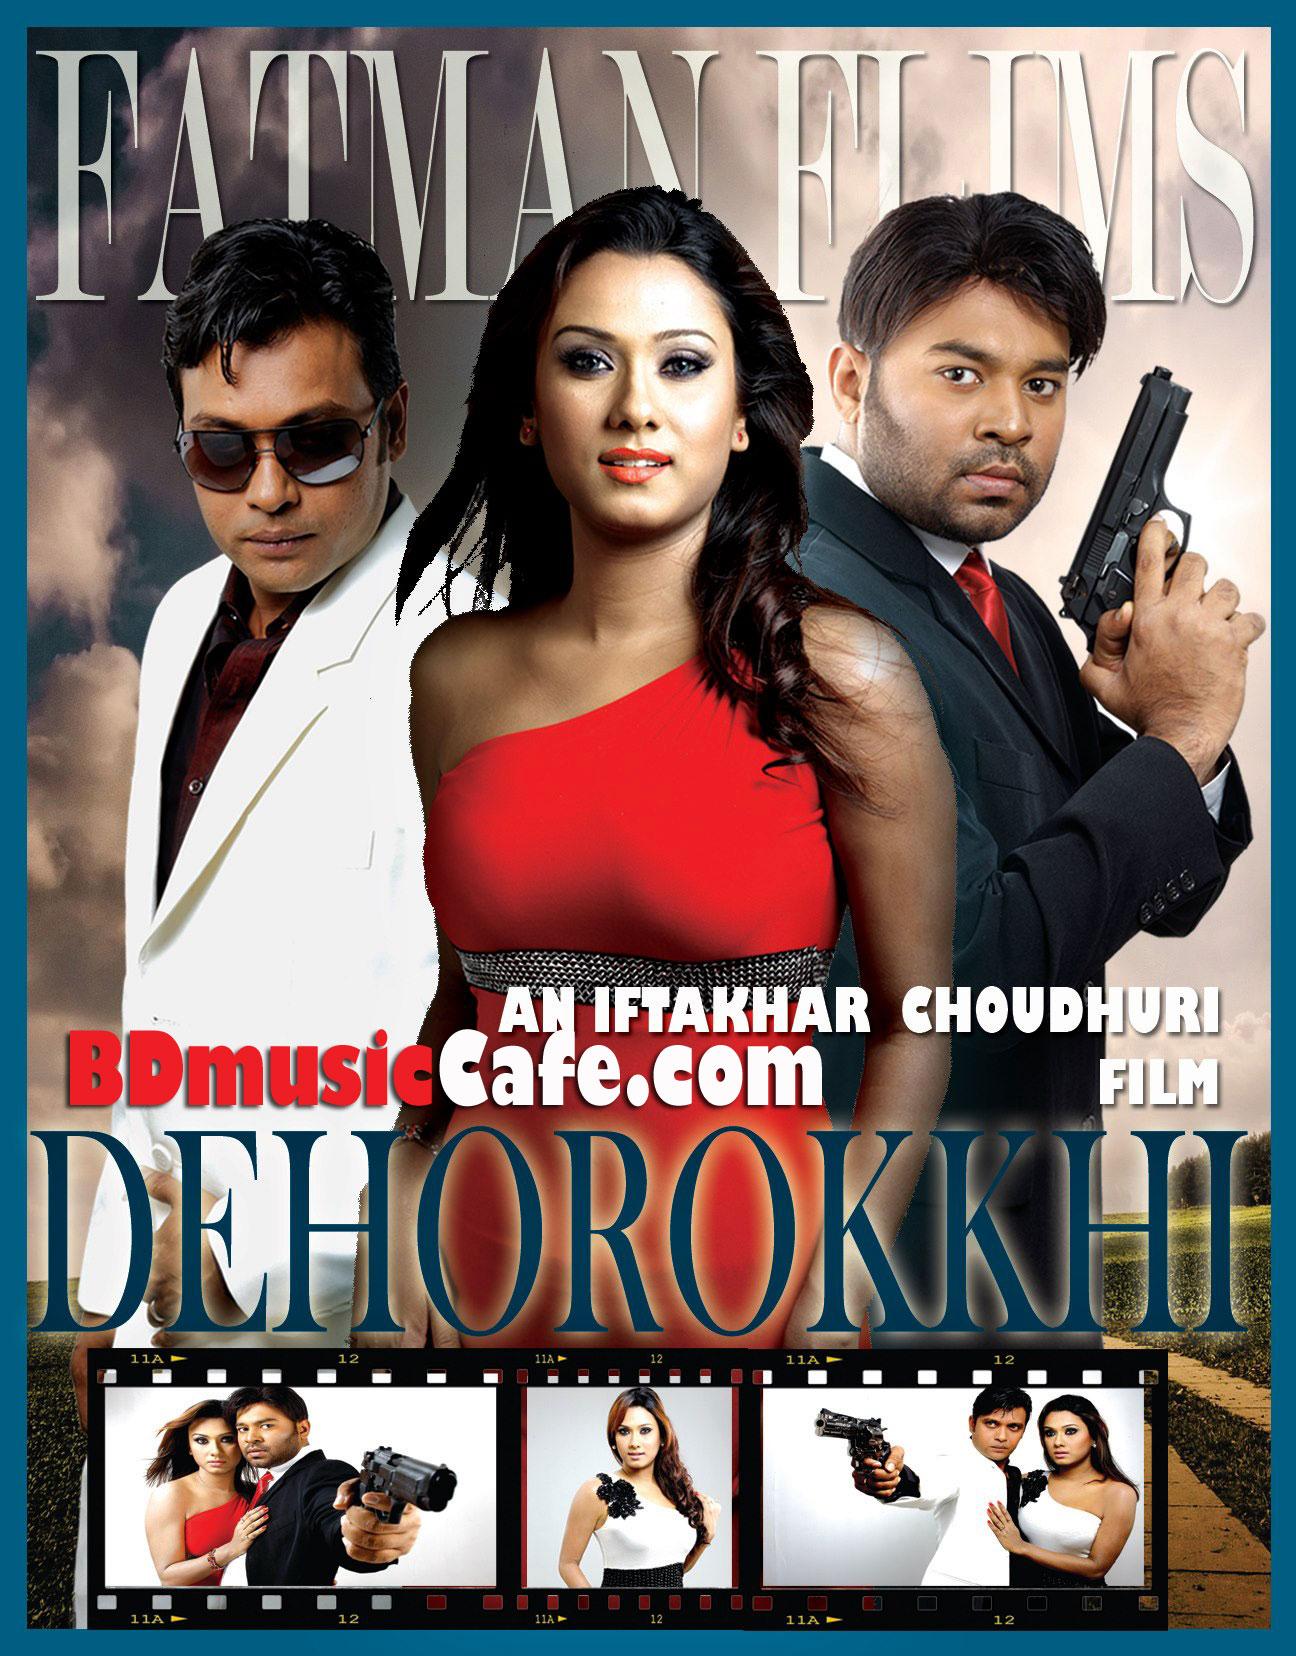 Dehorokkhi-Cd